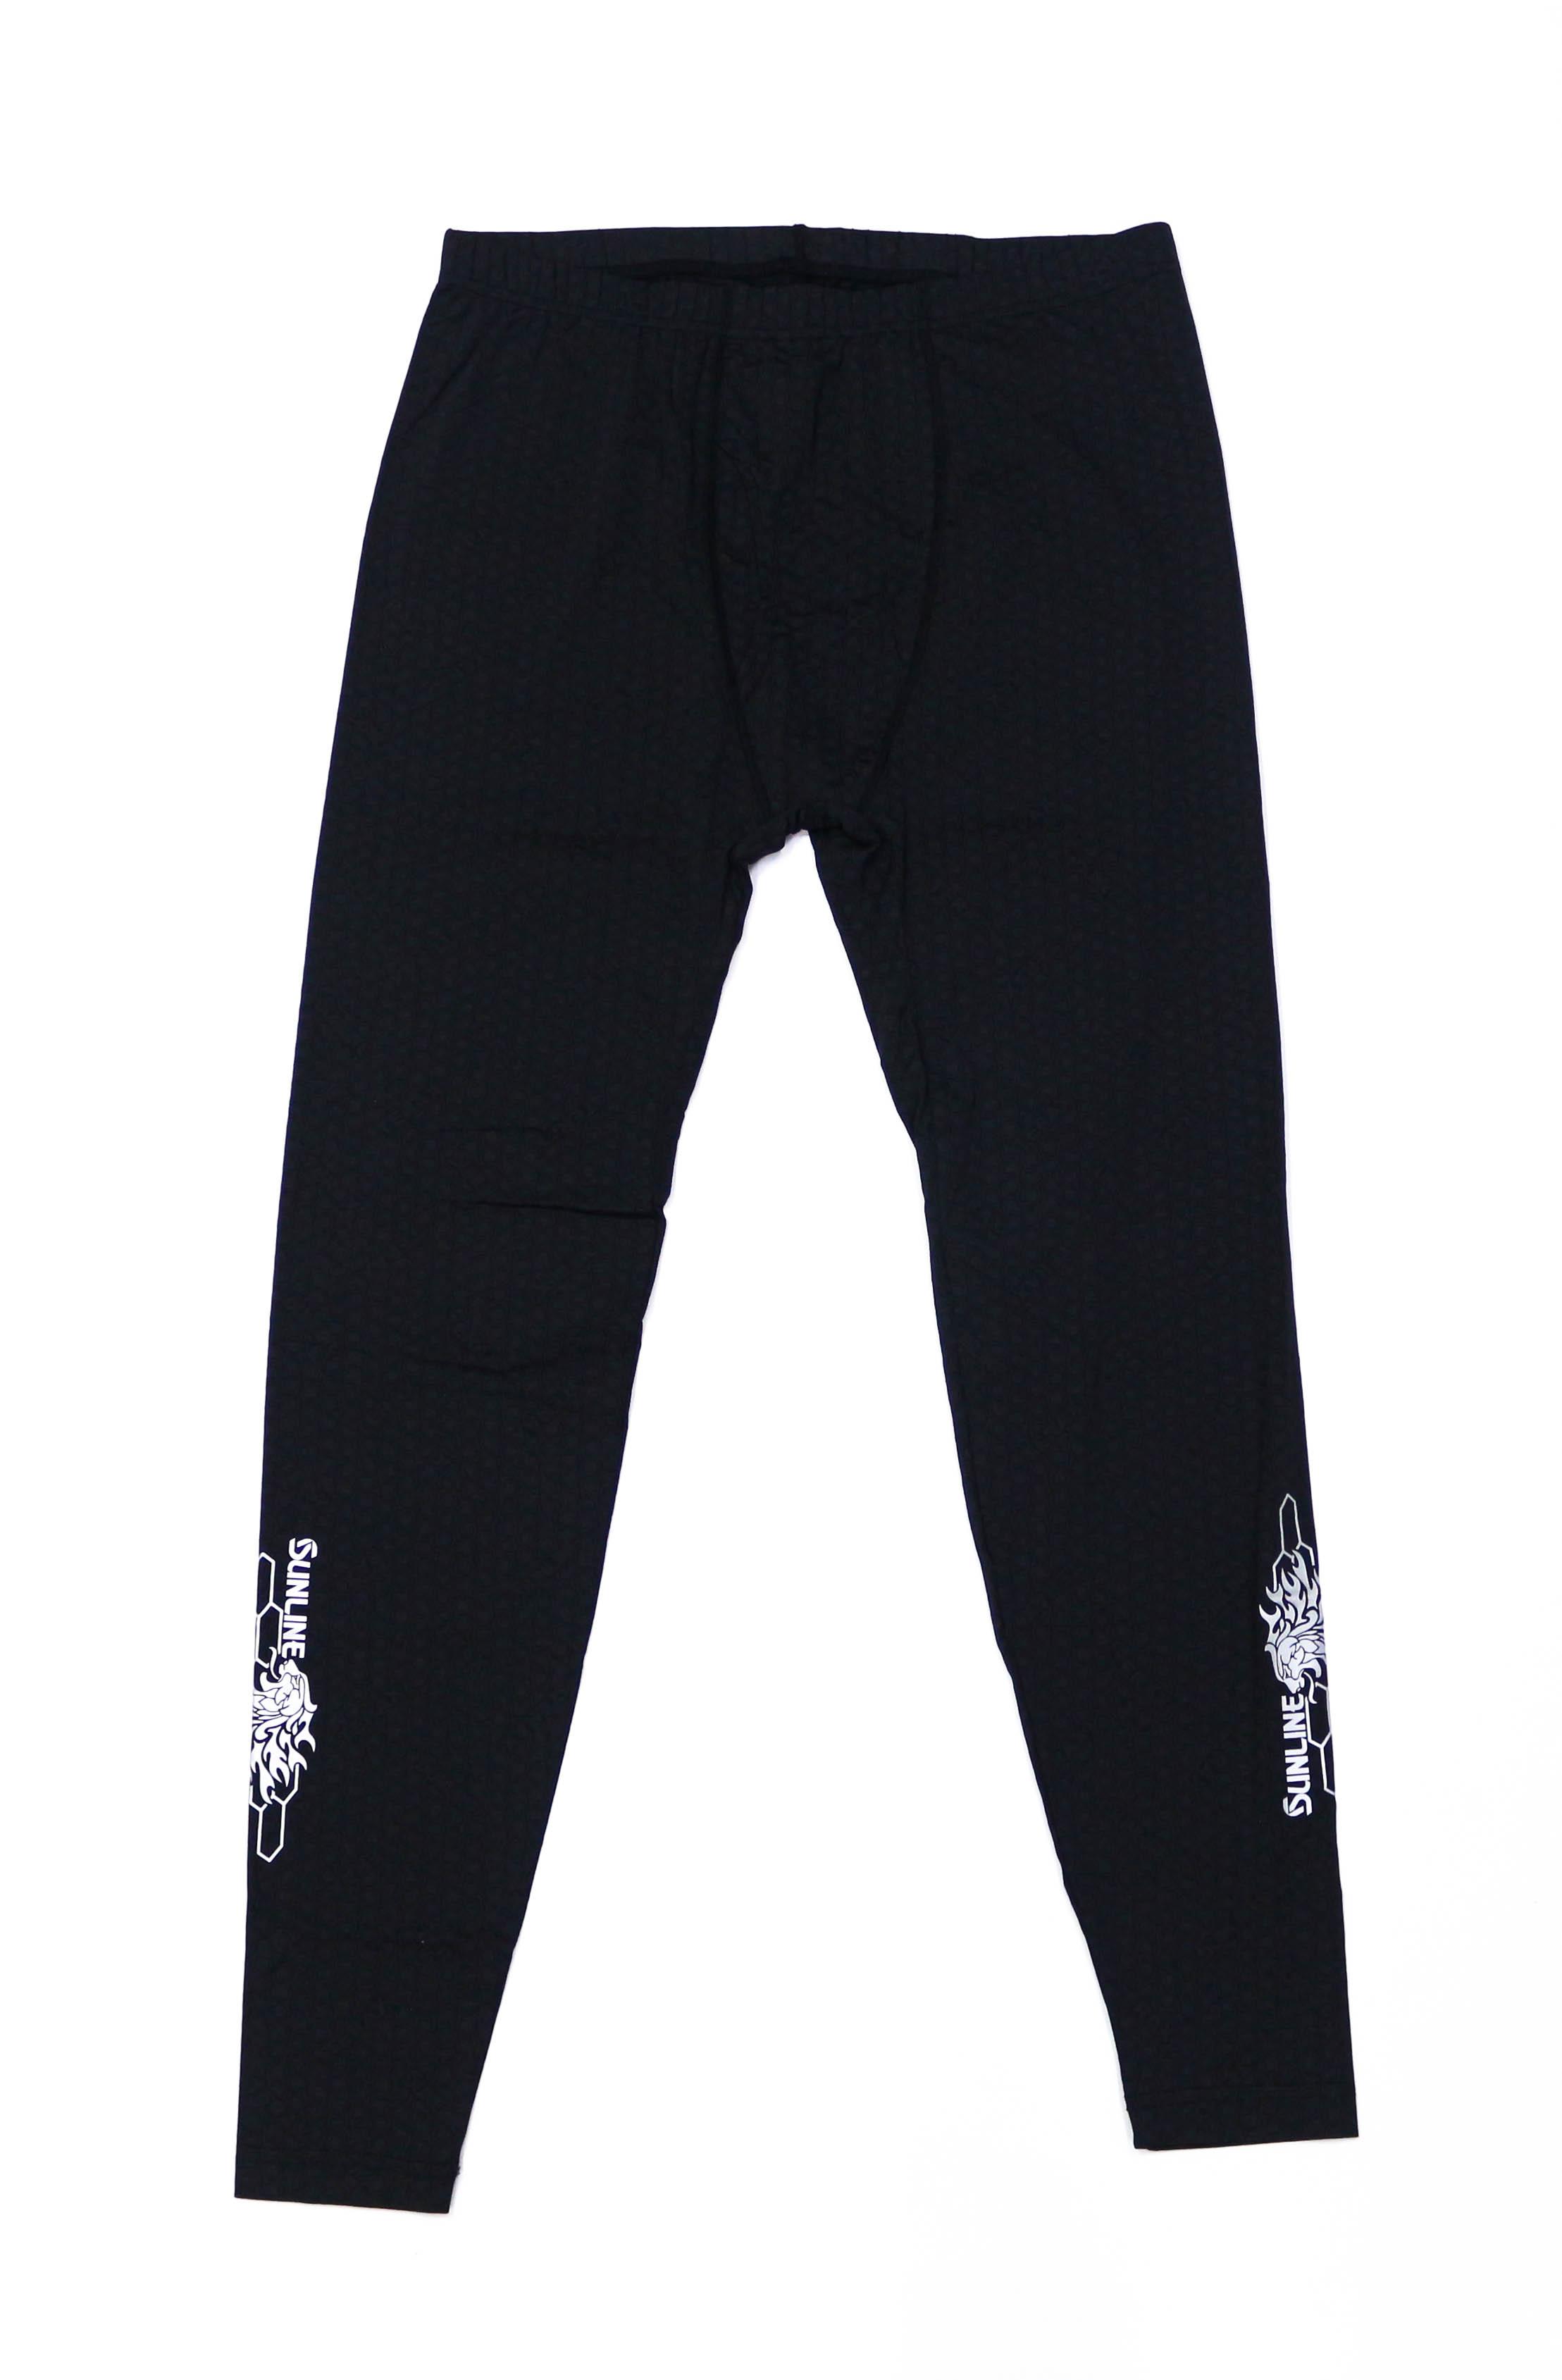 Sunline SUW-5536CW Underpants Terax Cool Black Size L (2488)